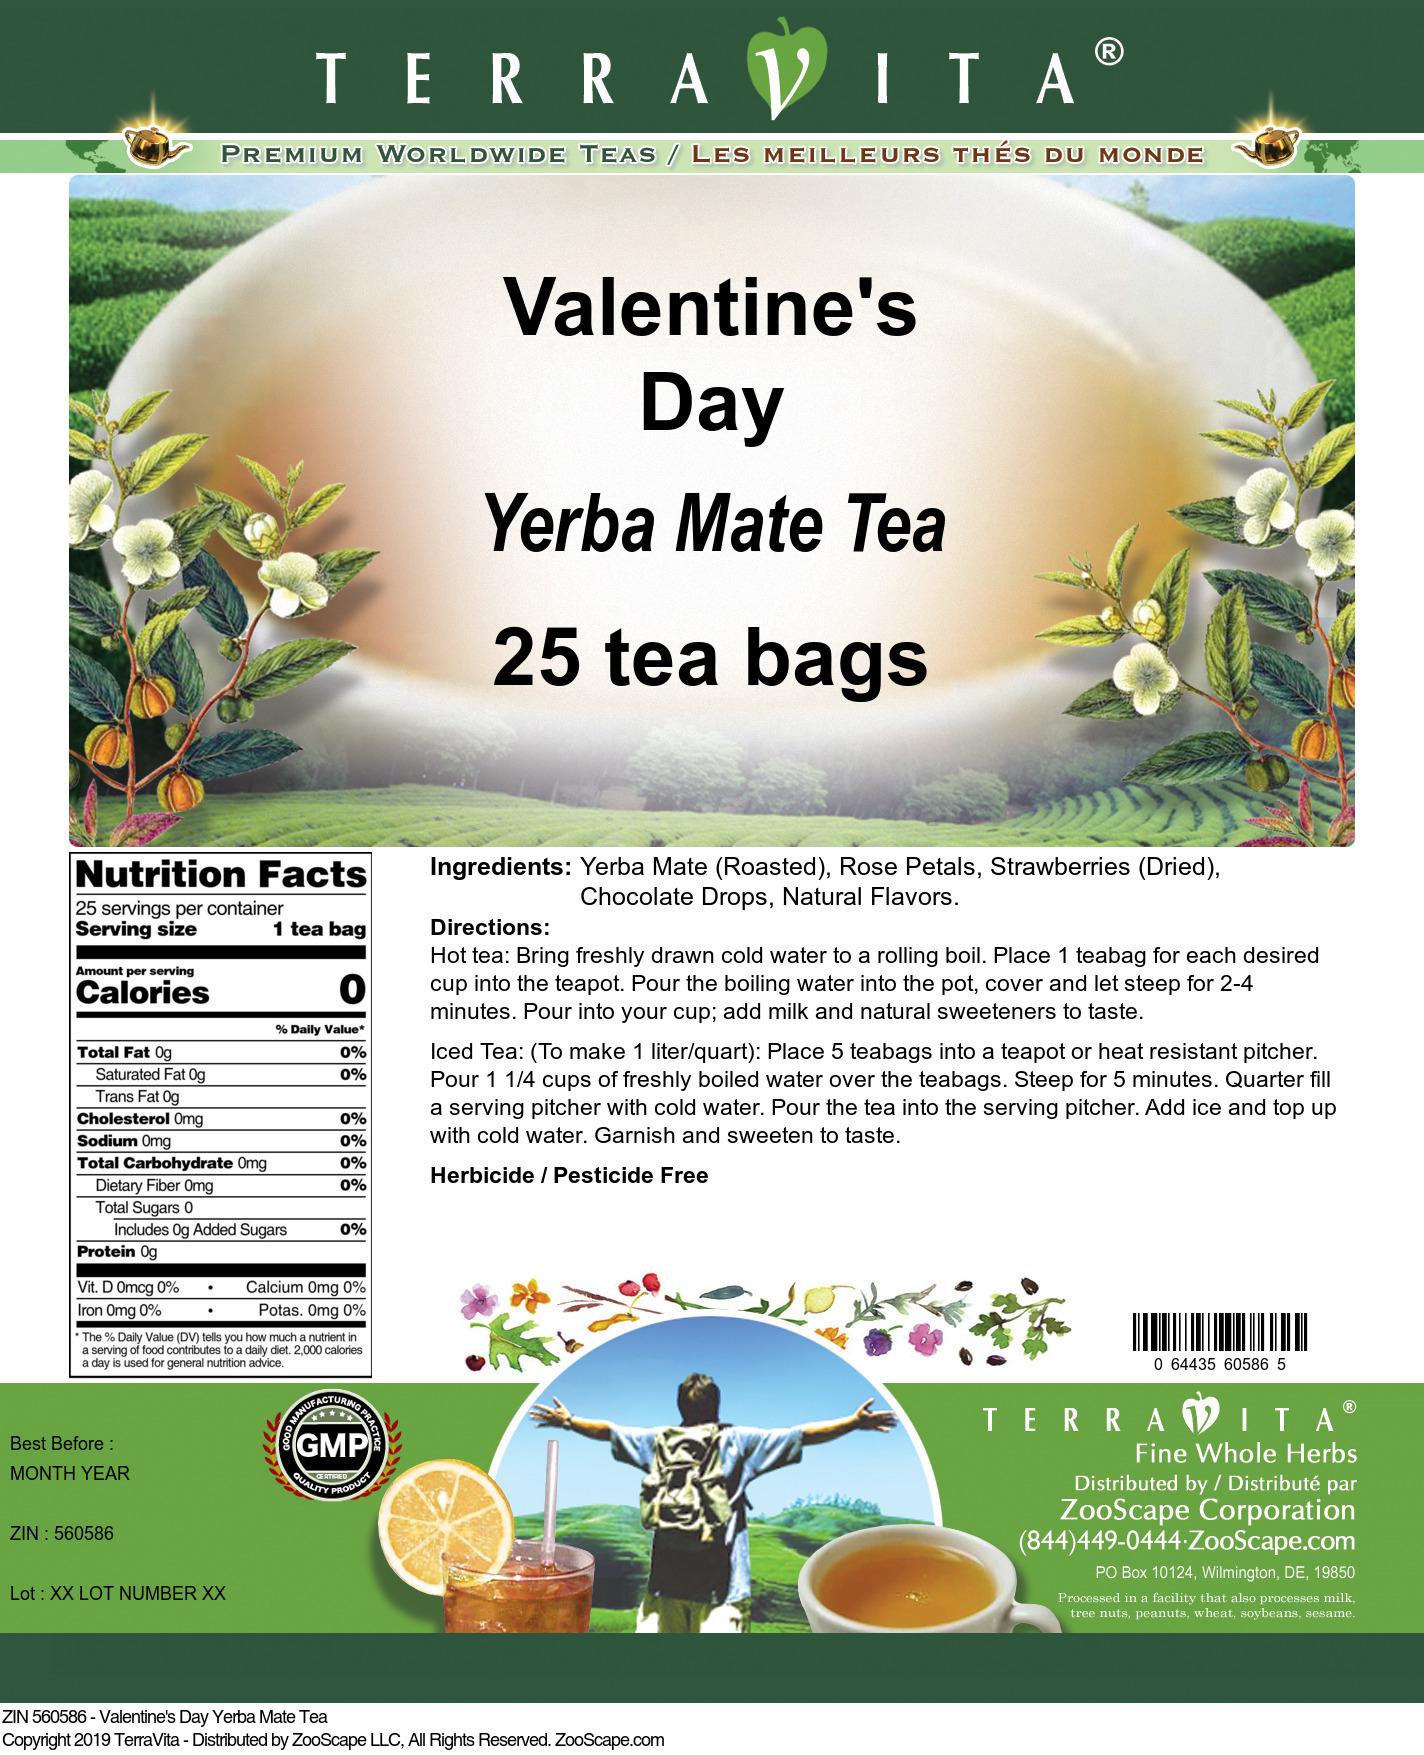 Valentine's Day Yerba Mate Tea